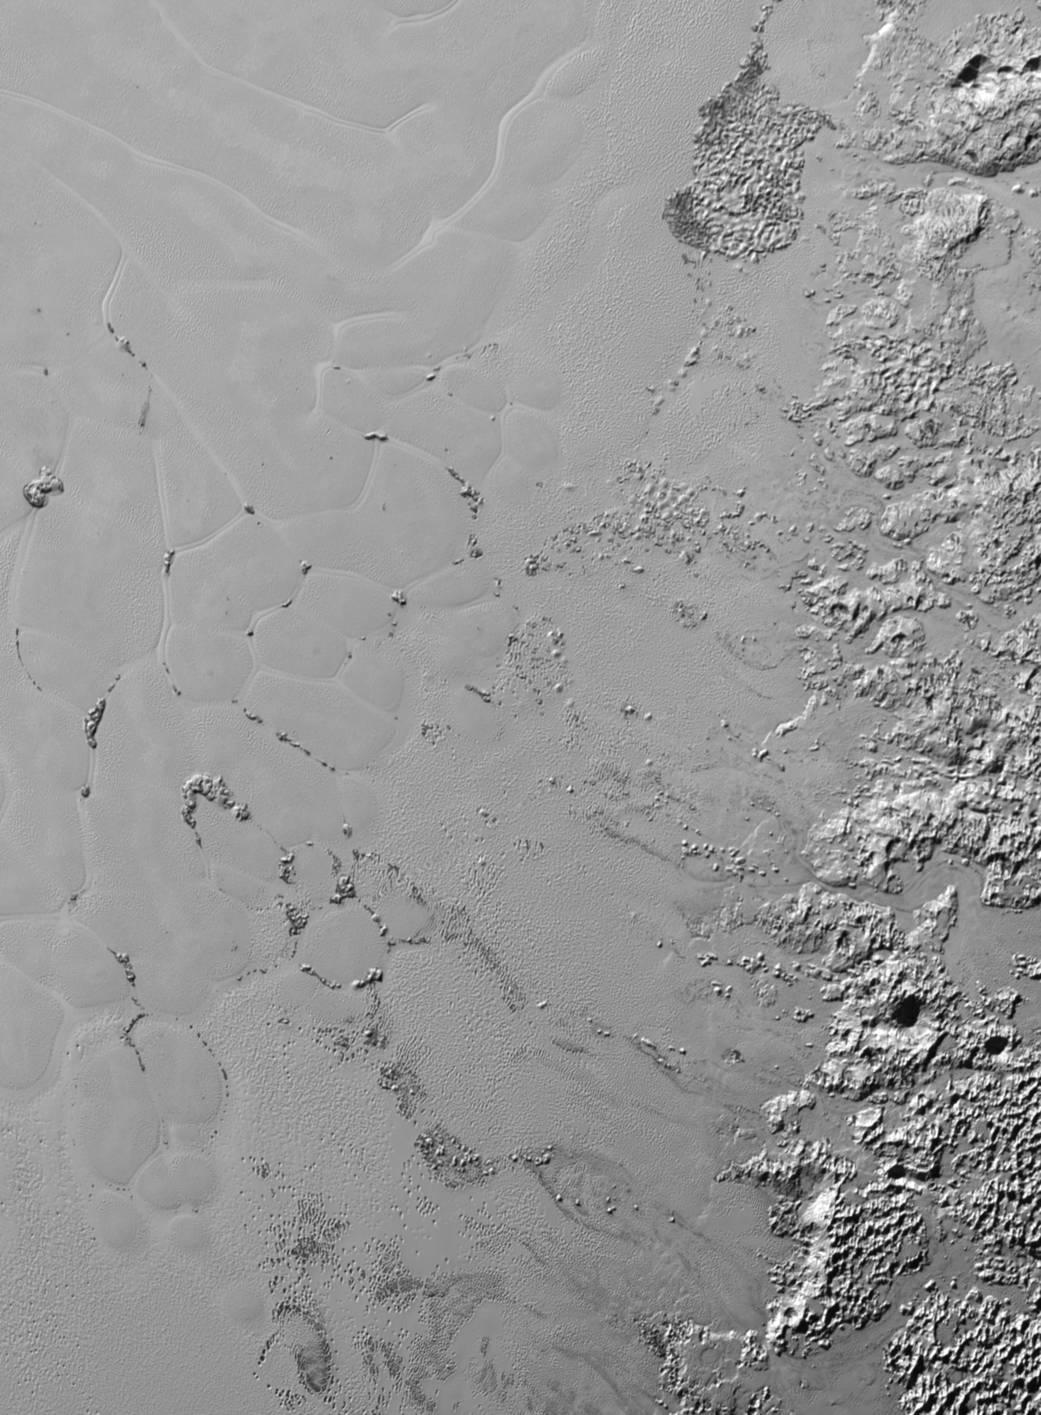 Pluto Terrain